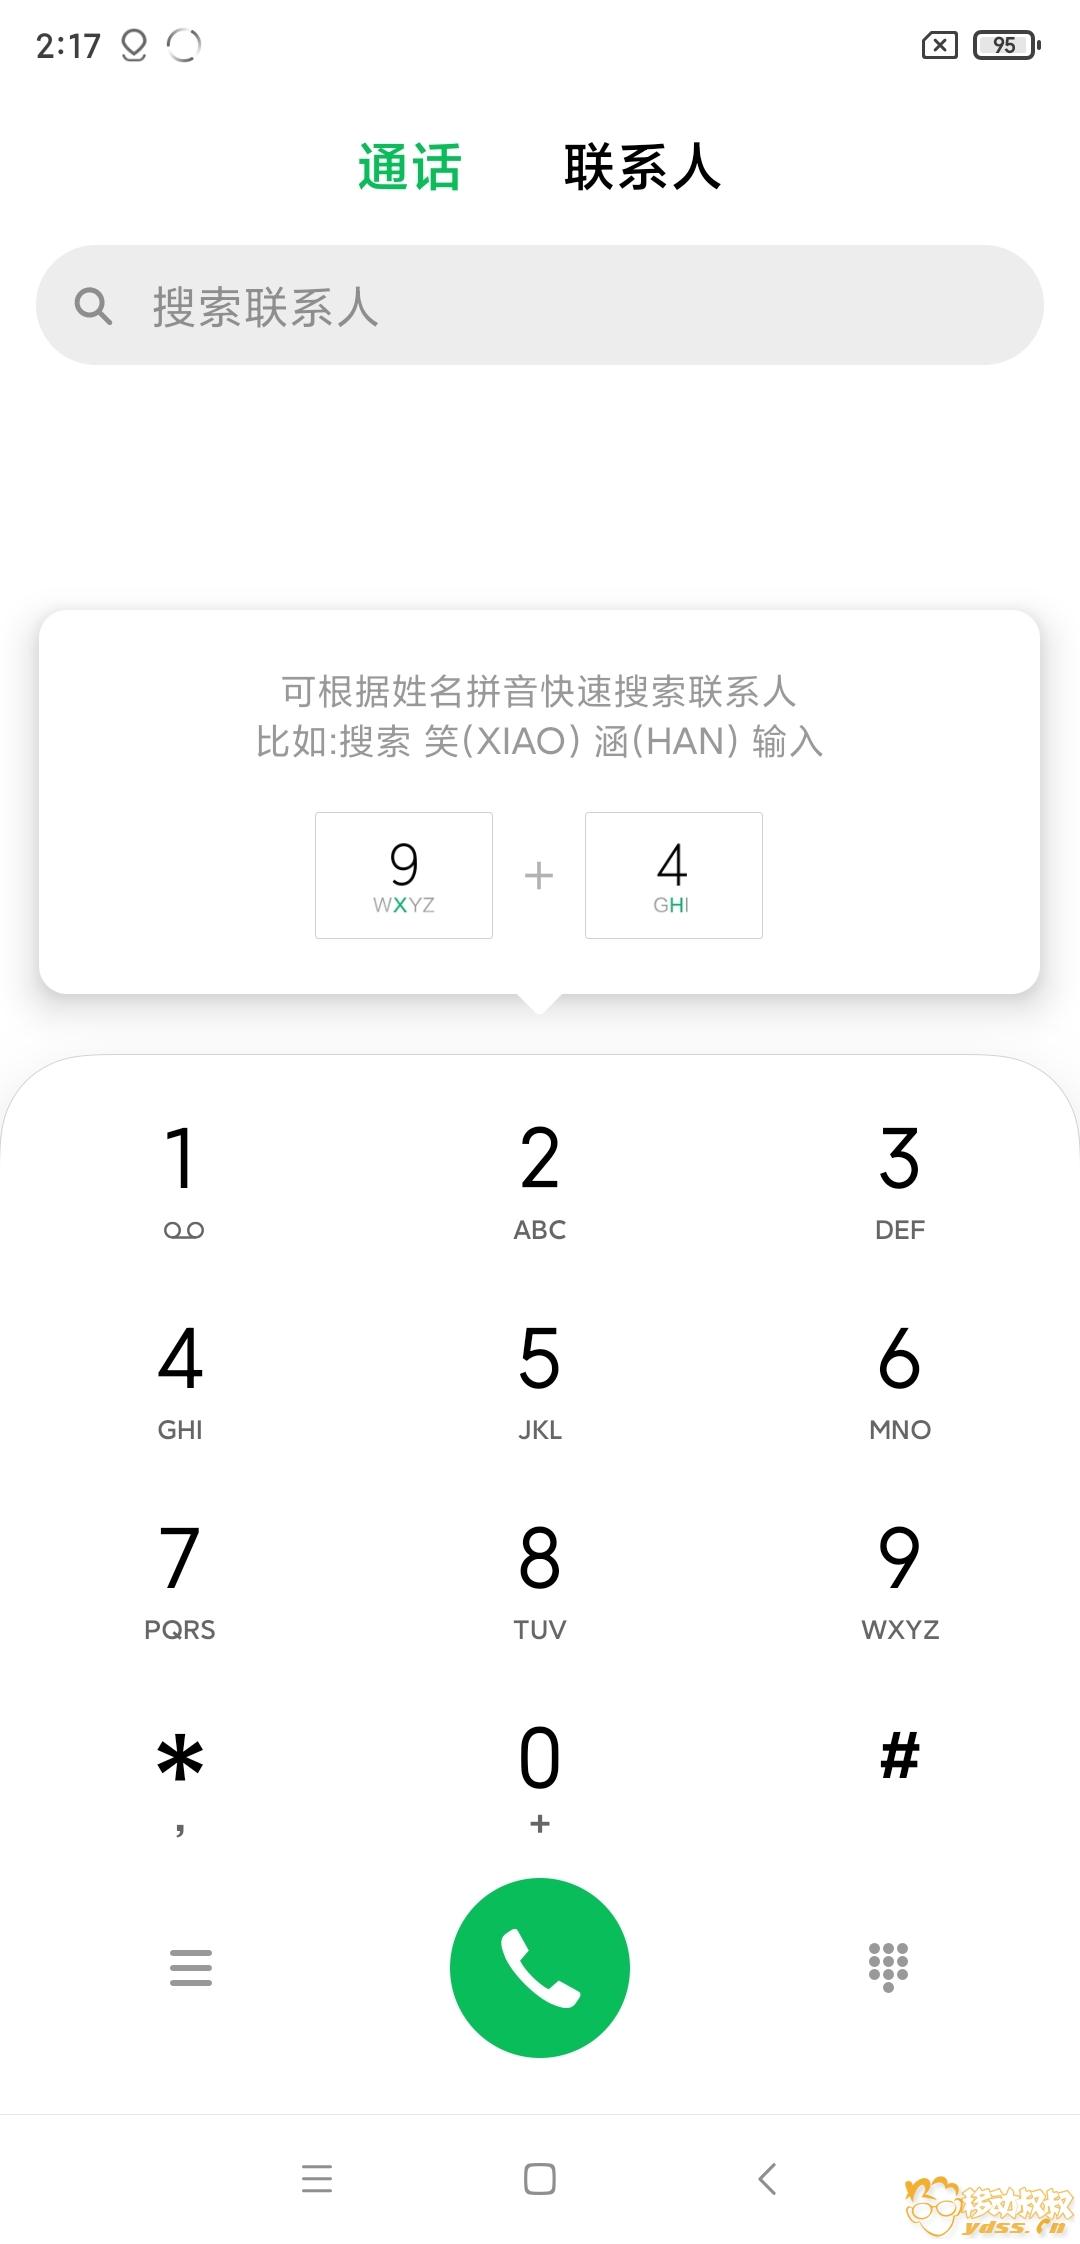 Screenshot_2020-01-20-02-17-50-327_com.android.contacts.jpg